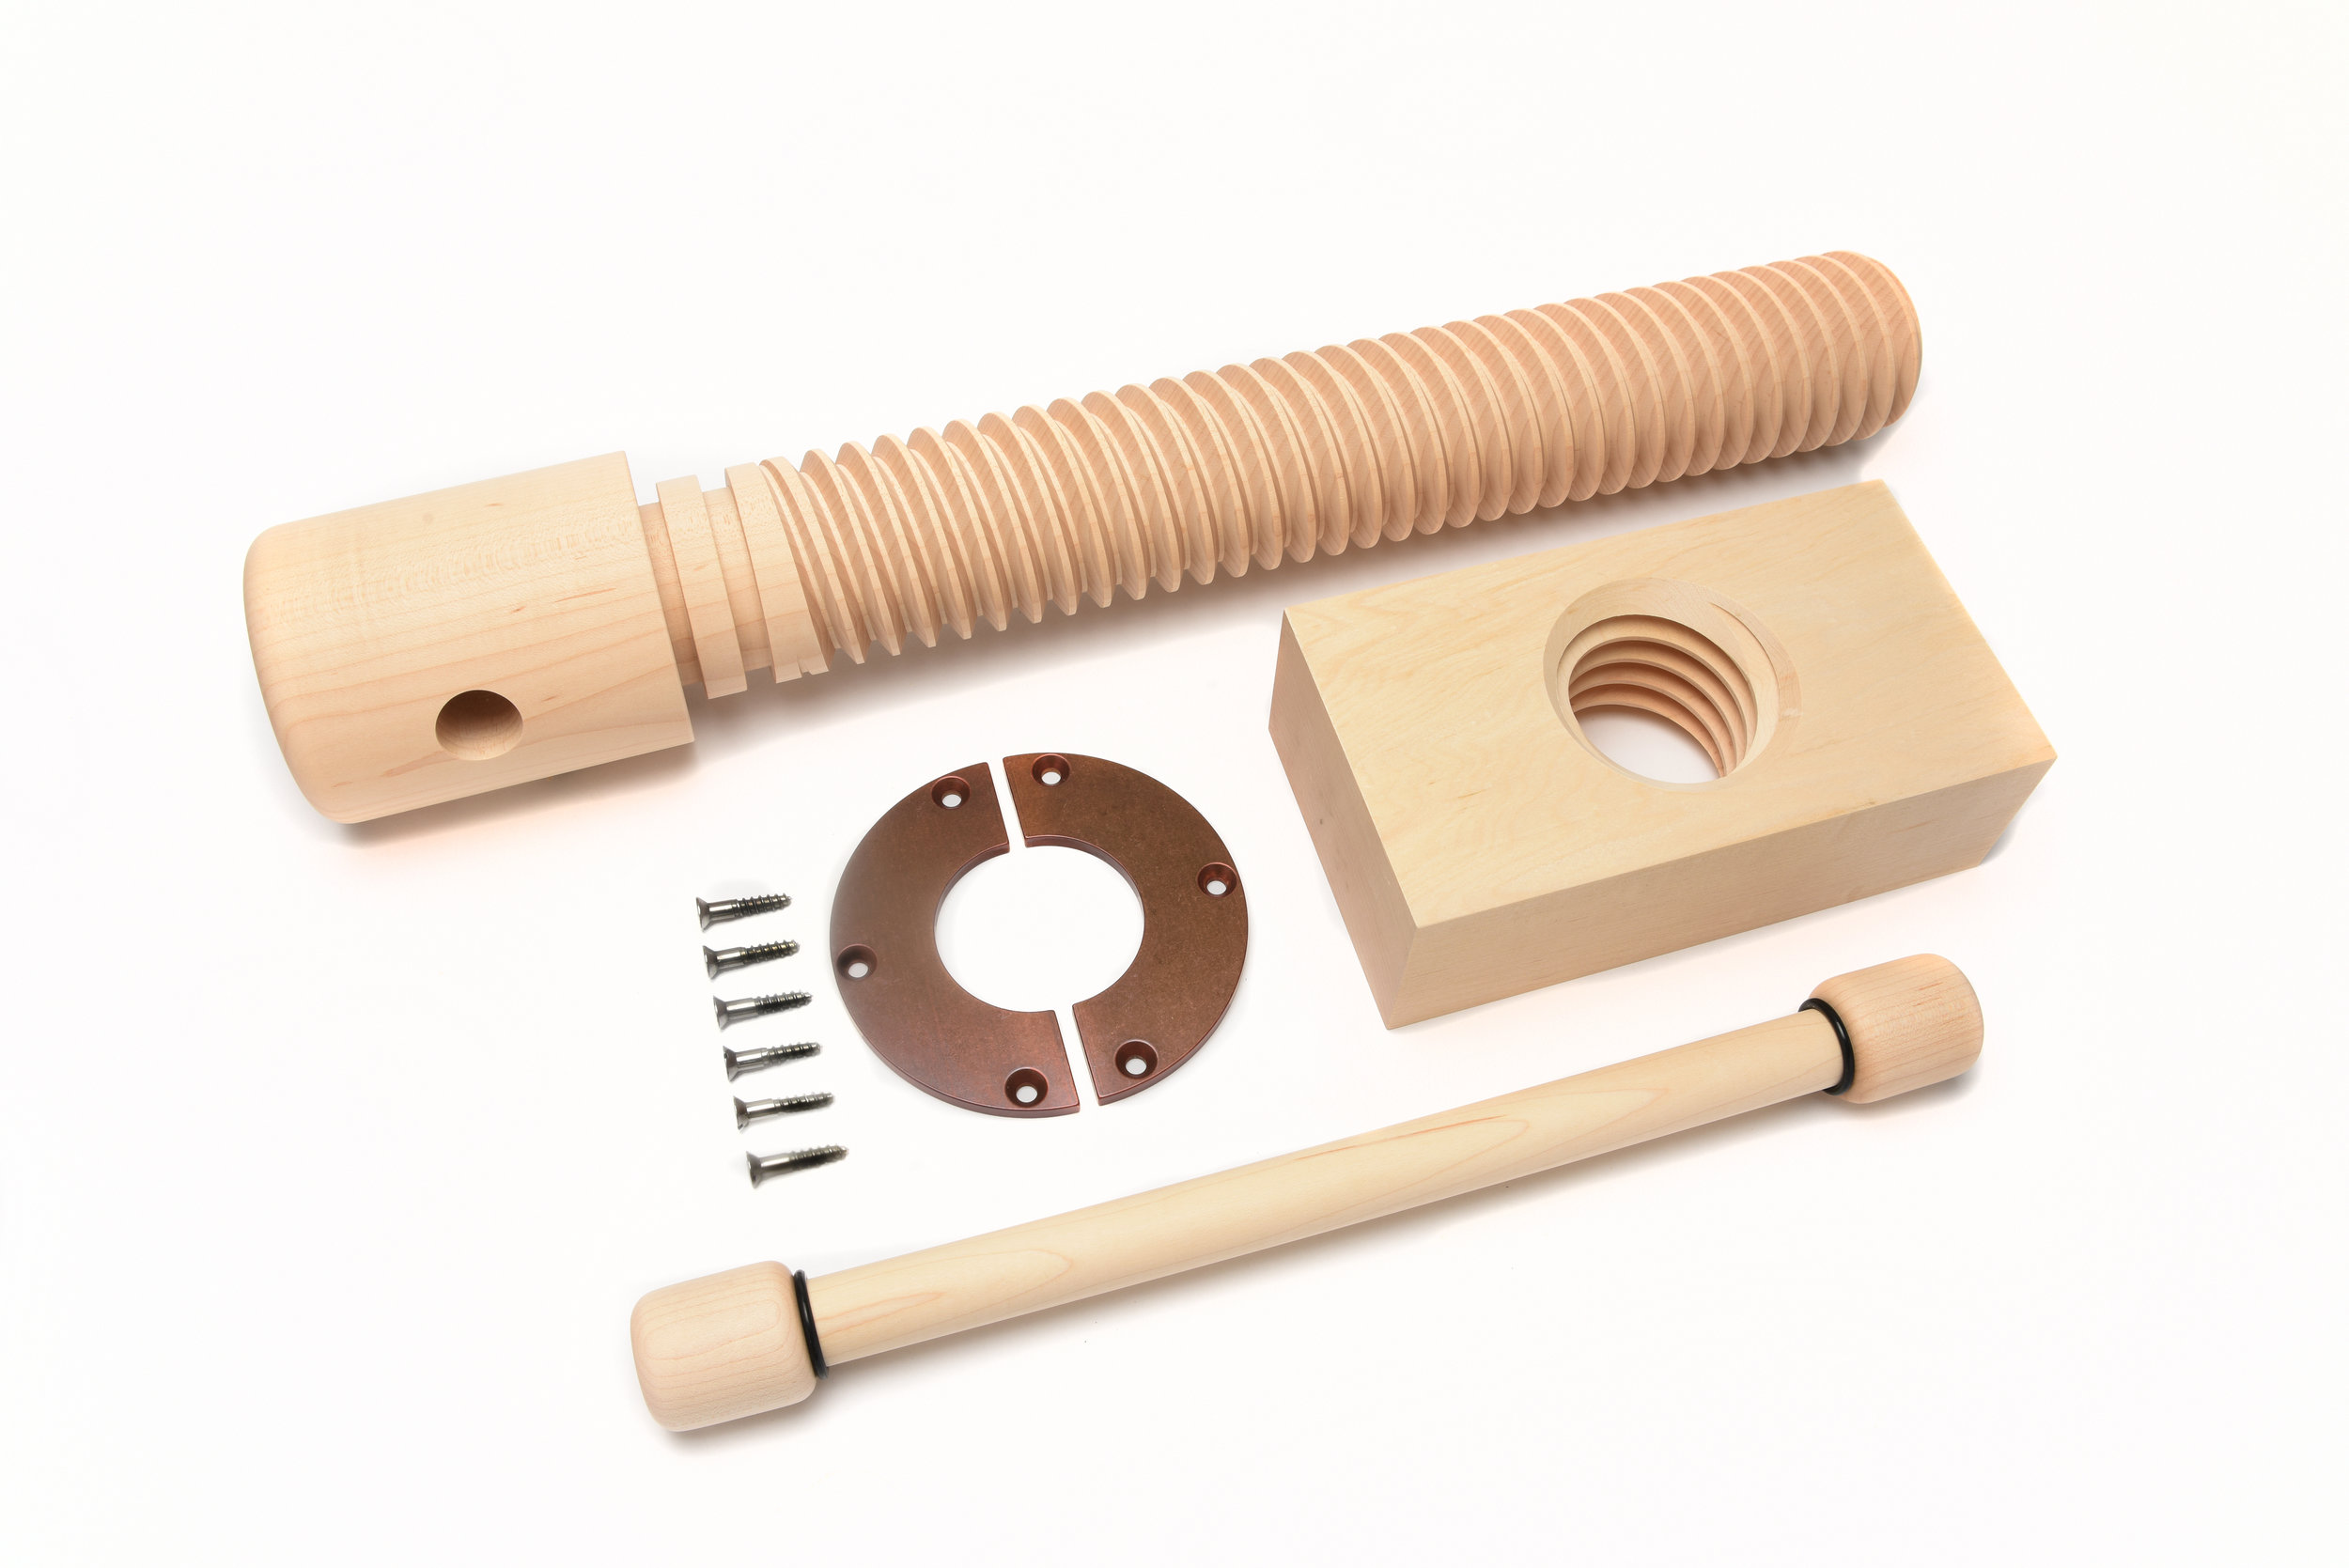 1005-001 - 2X Wood Vise Screw Premium Kit -Vintage Finish.jpg